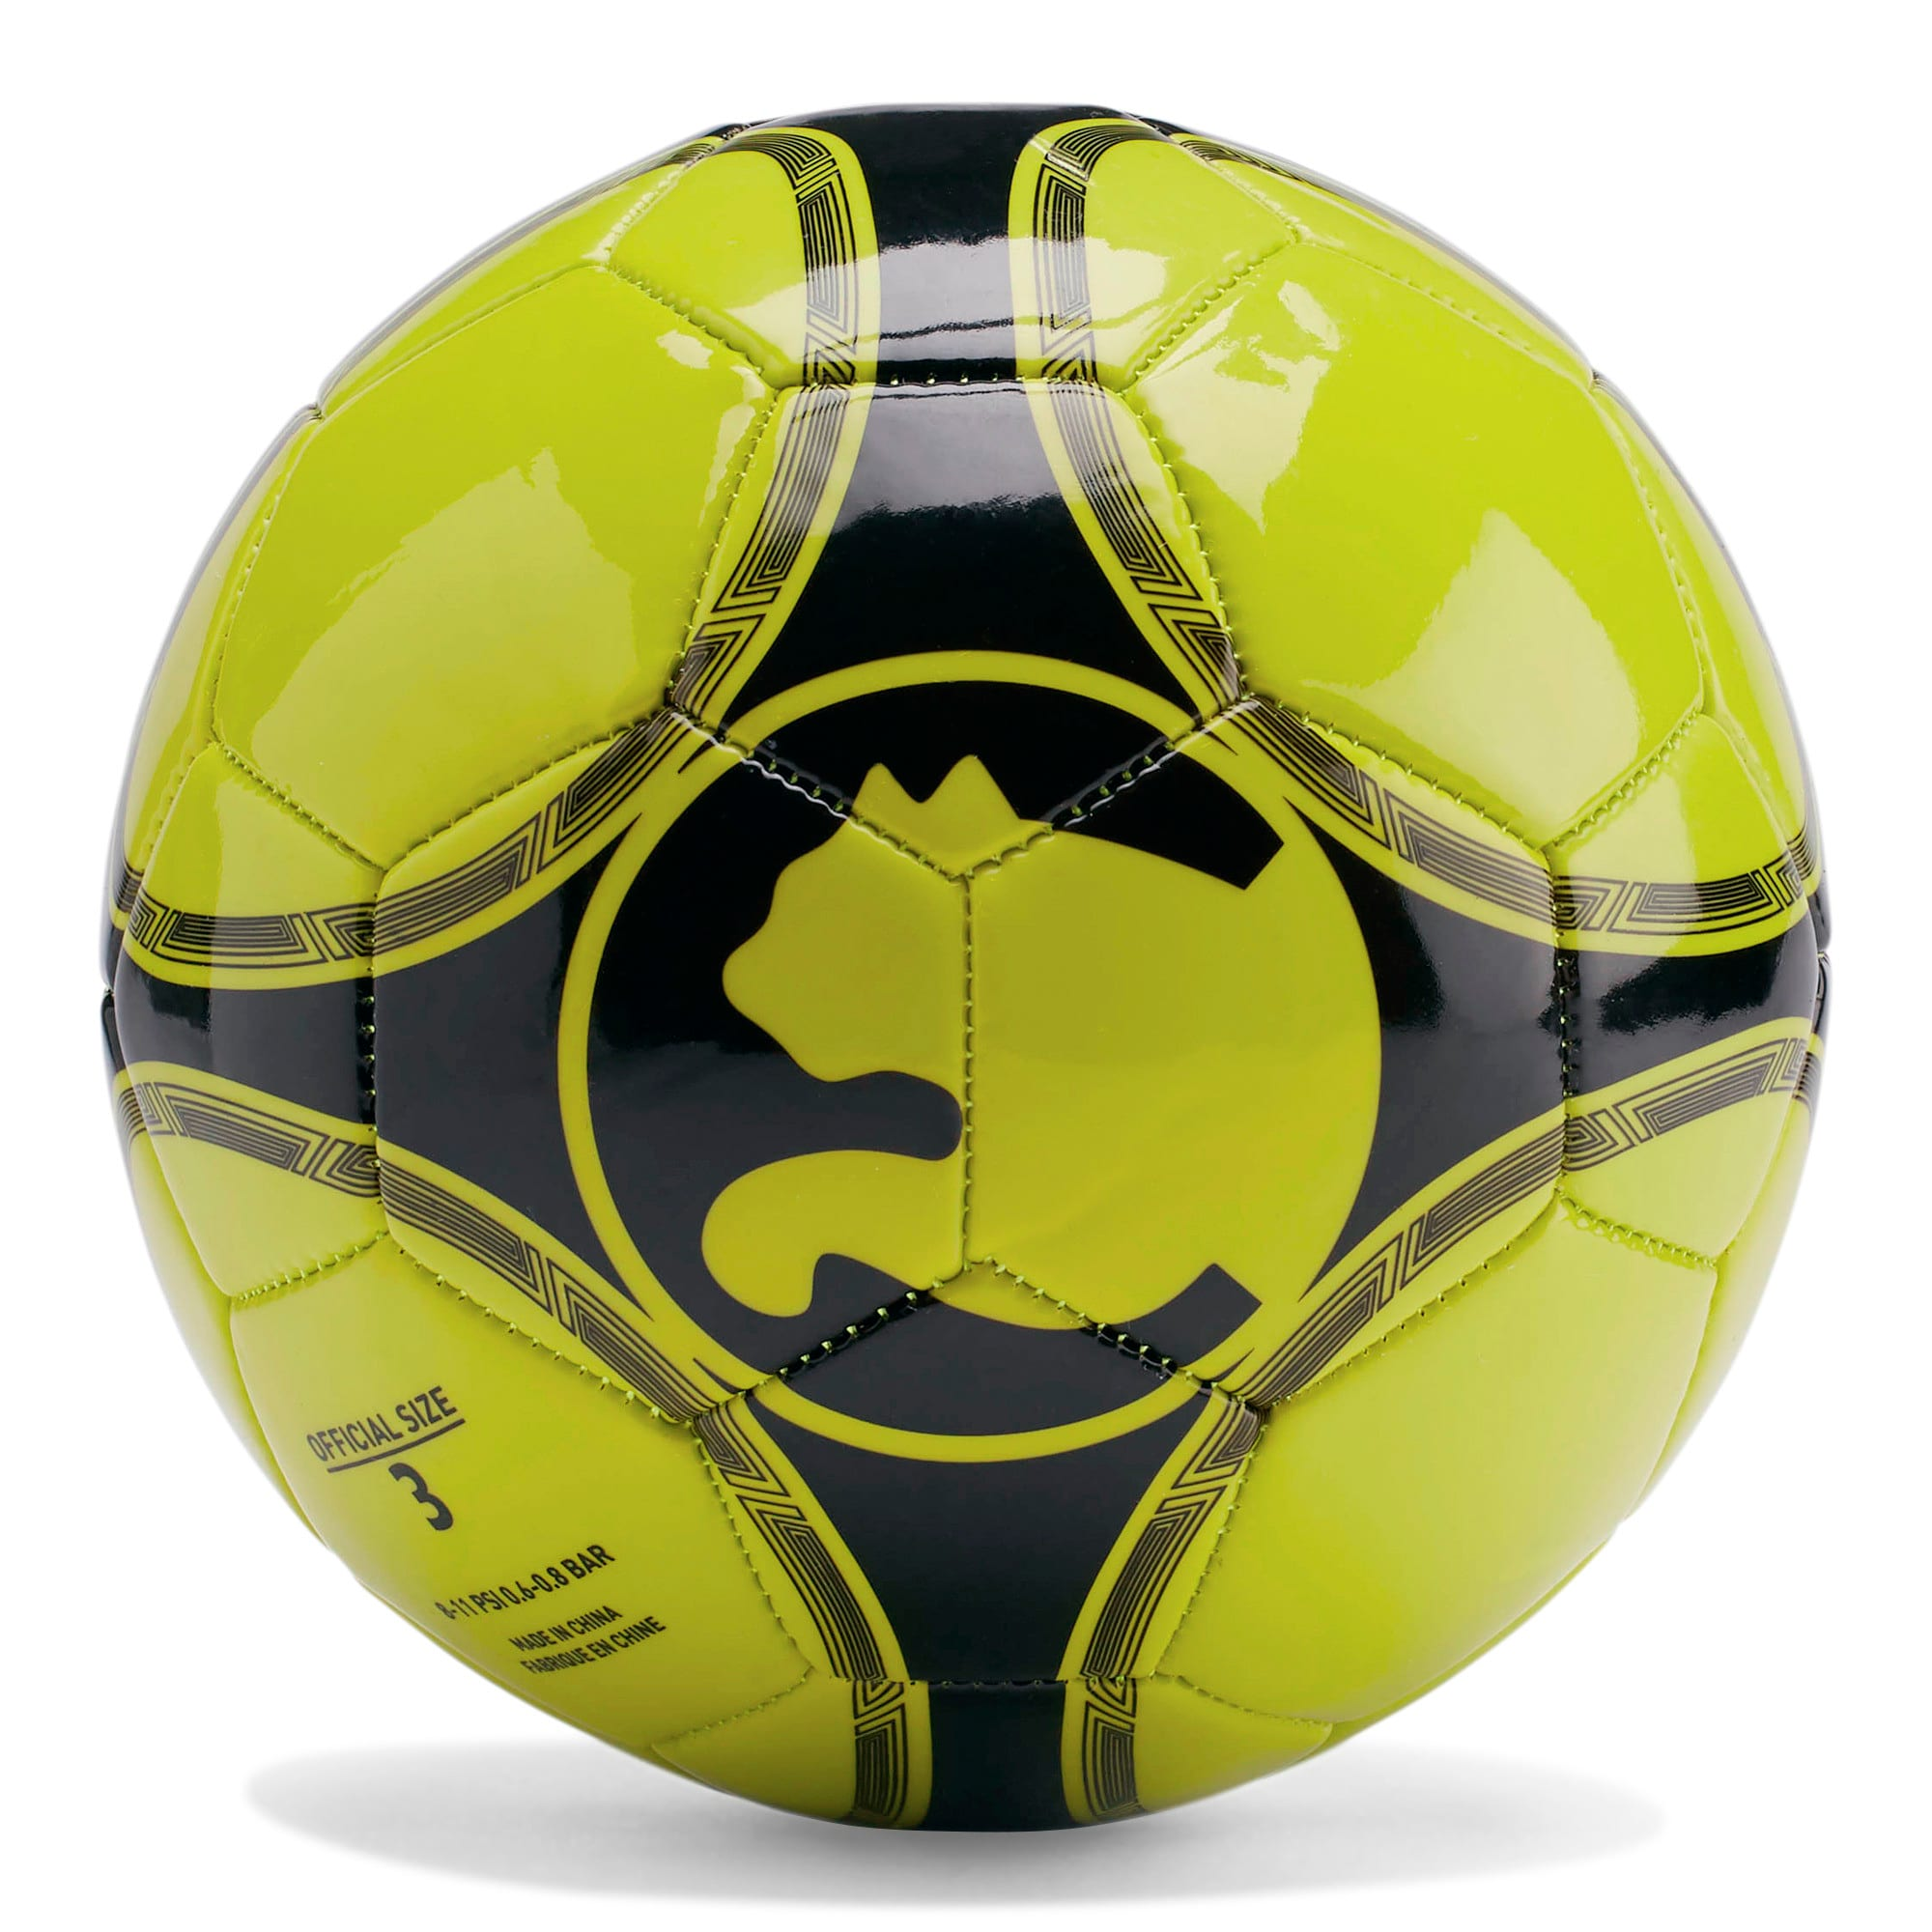 Thumbnail 1 of ProCat ProPass Soccer Ball, LIME, medium